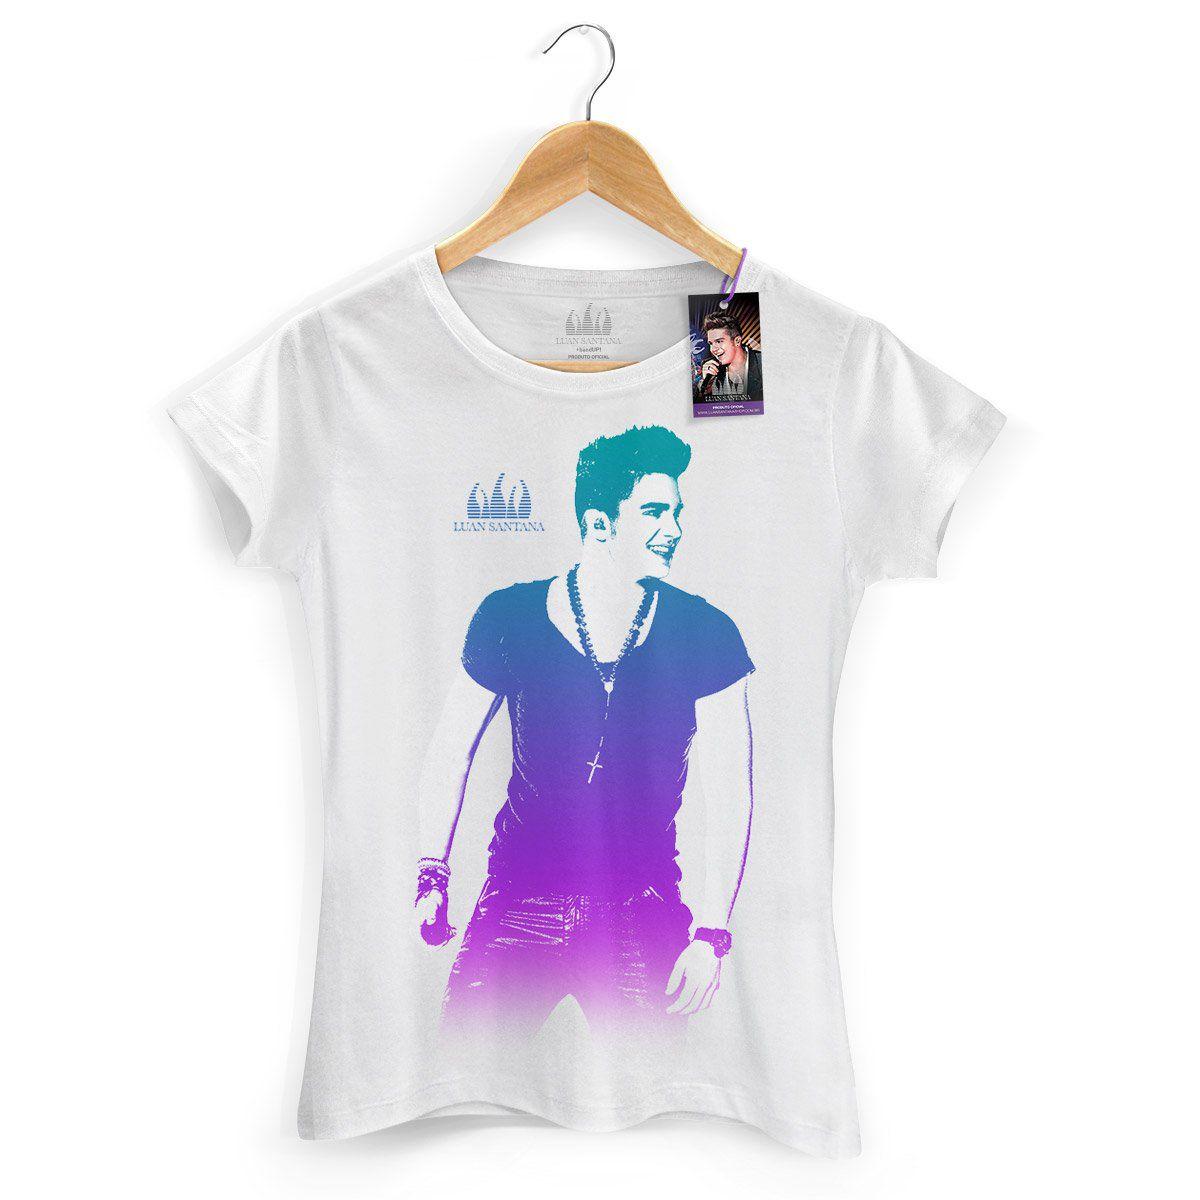 Camiseta Feminina Luan Santana Foto Degradê Branca  - bandUP Store Marketplace